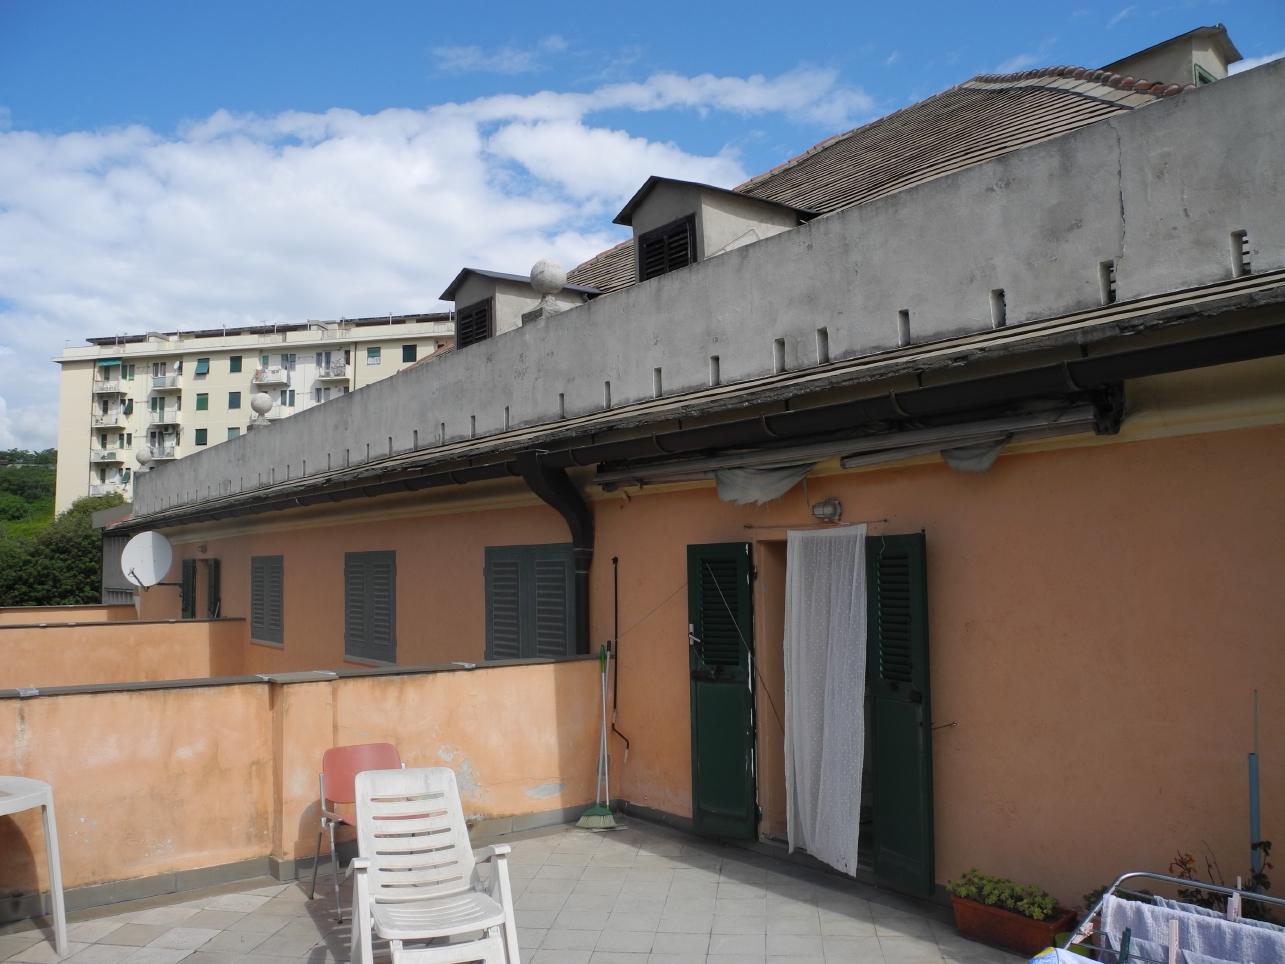 Palazzo Piuma (palazzo, patrizio) - Genova (GE)